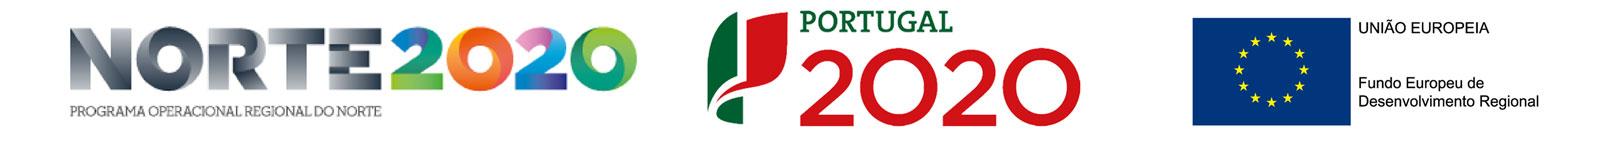 PORTUGAL_2020_TRUPPIFRUIT